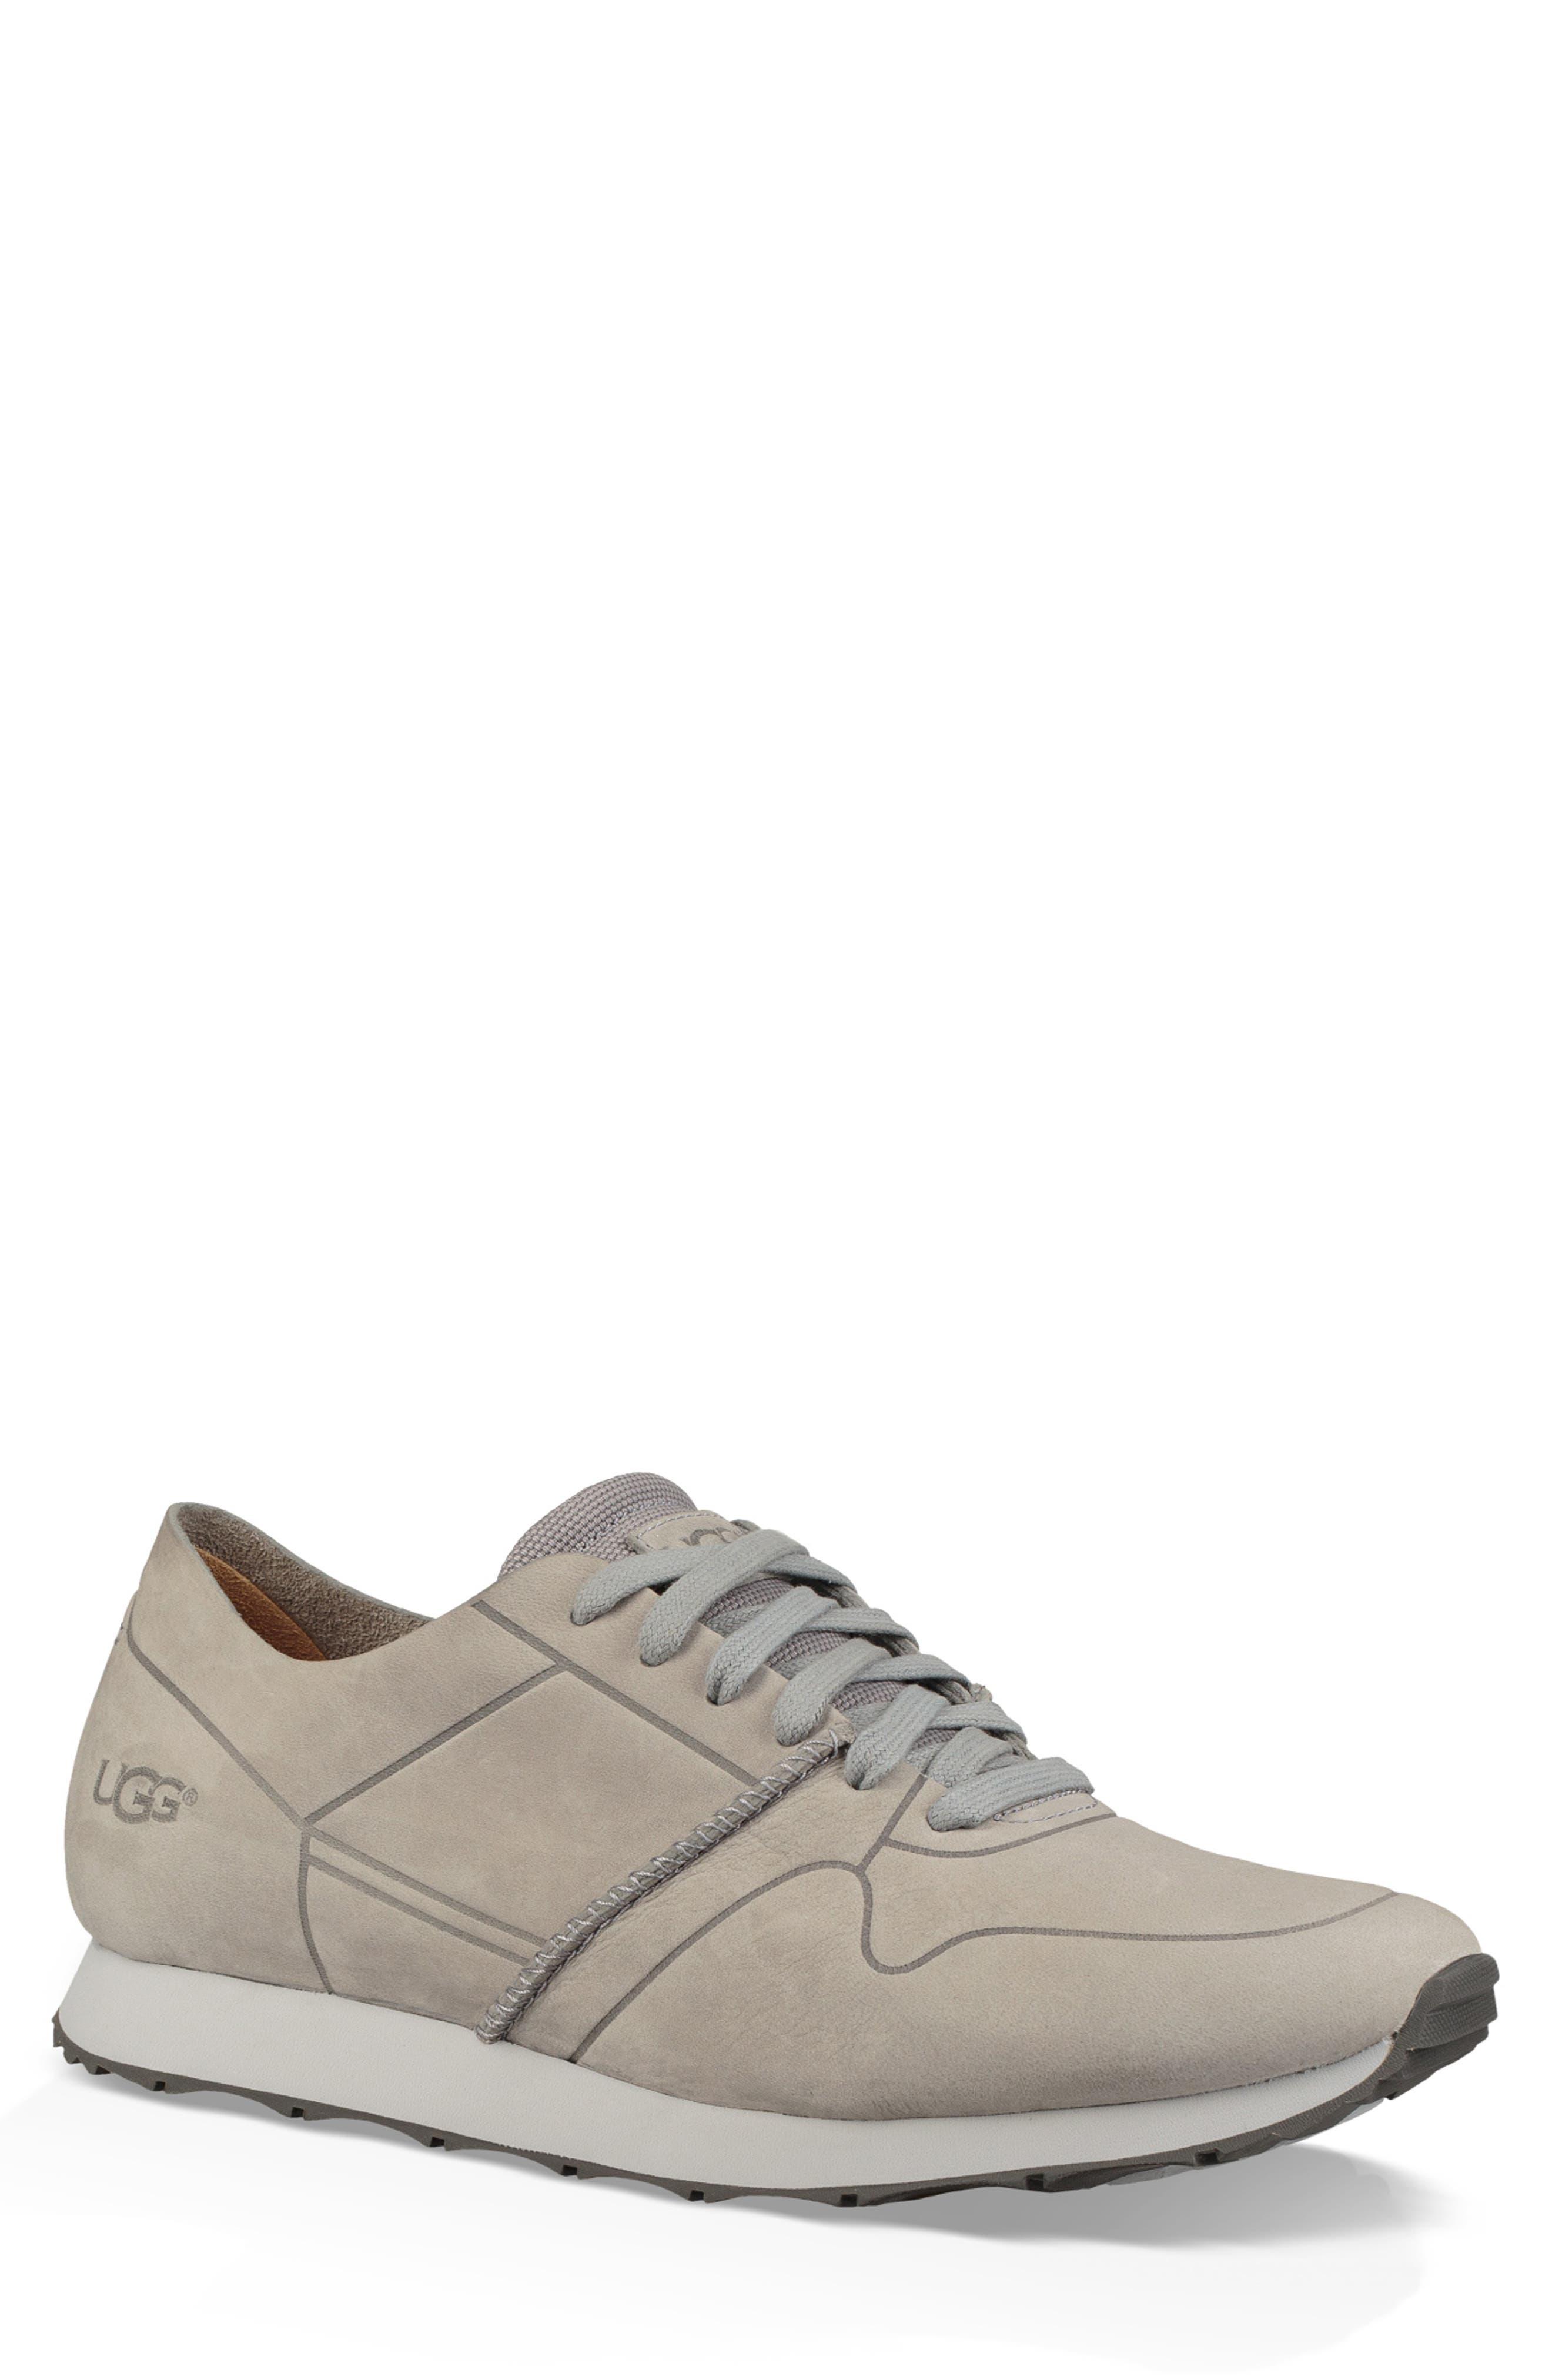 Trigo Unlined Sneaker,                             Main thumbnail 1, color,                             SEAL